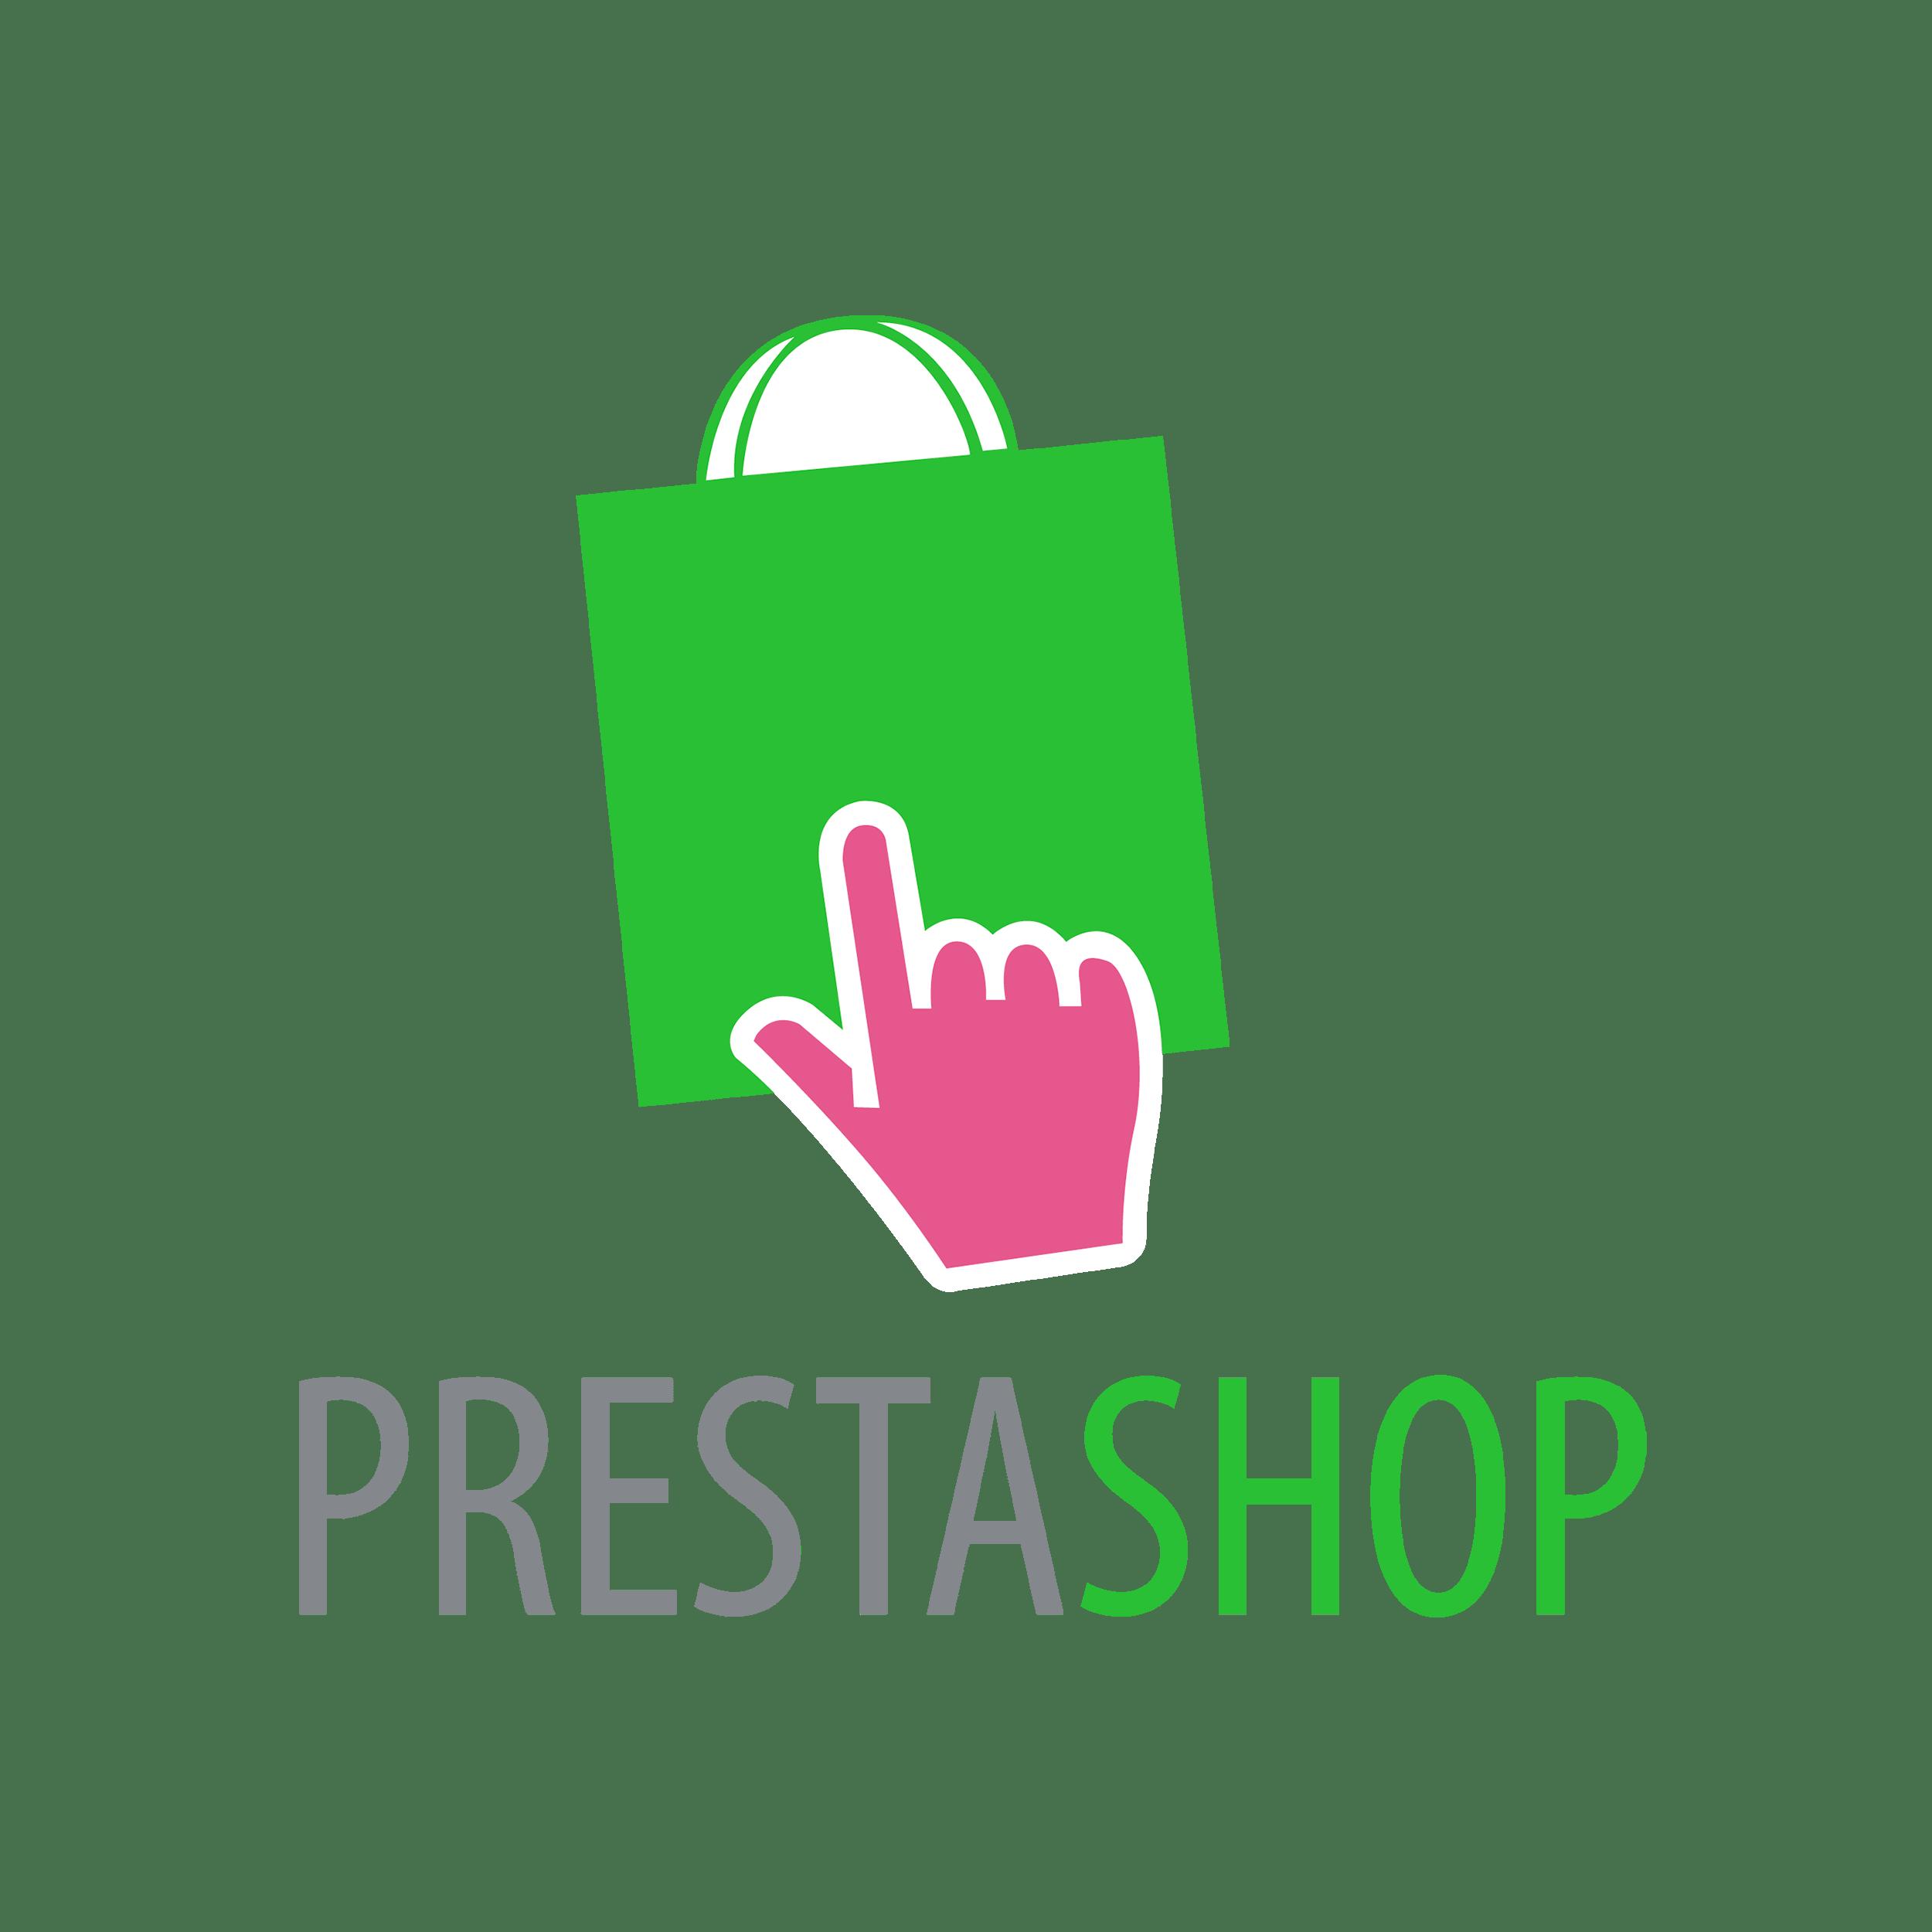 freelance-prestashop